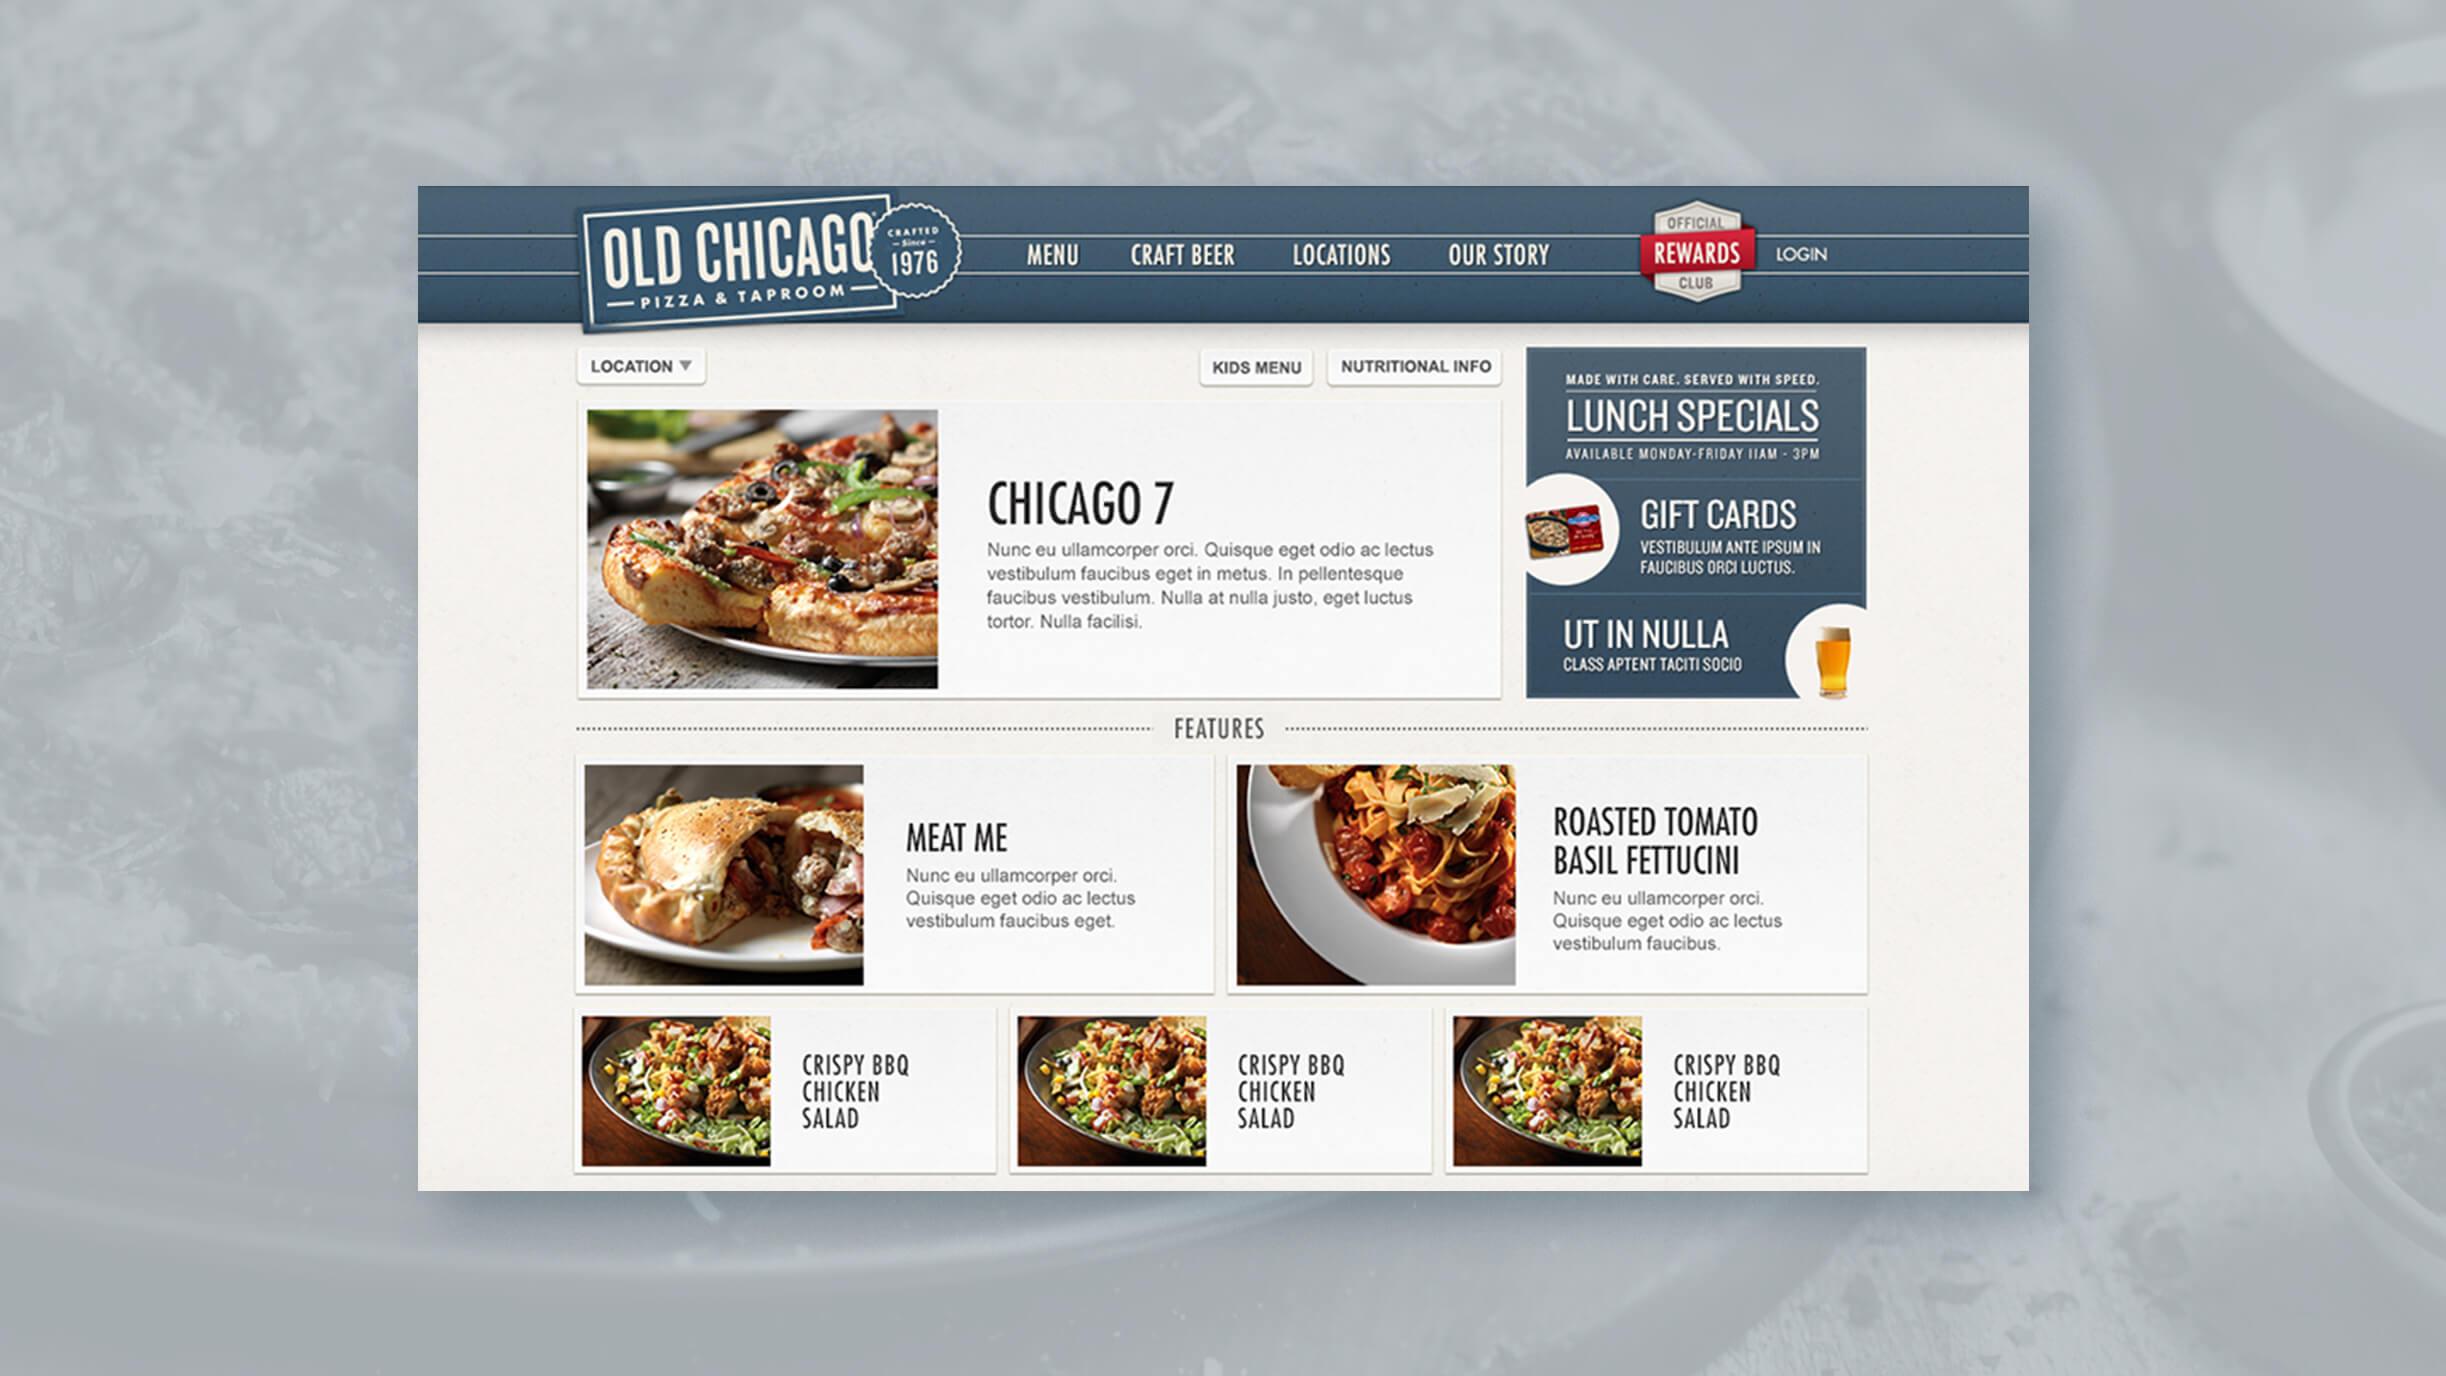 old-chicago-website-desktop-2.jpg